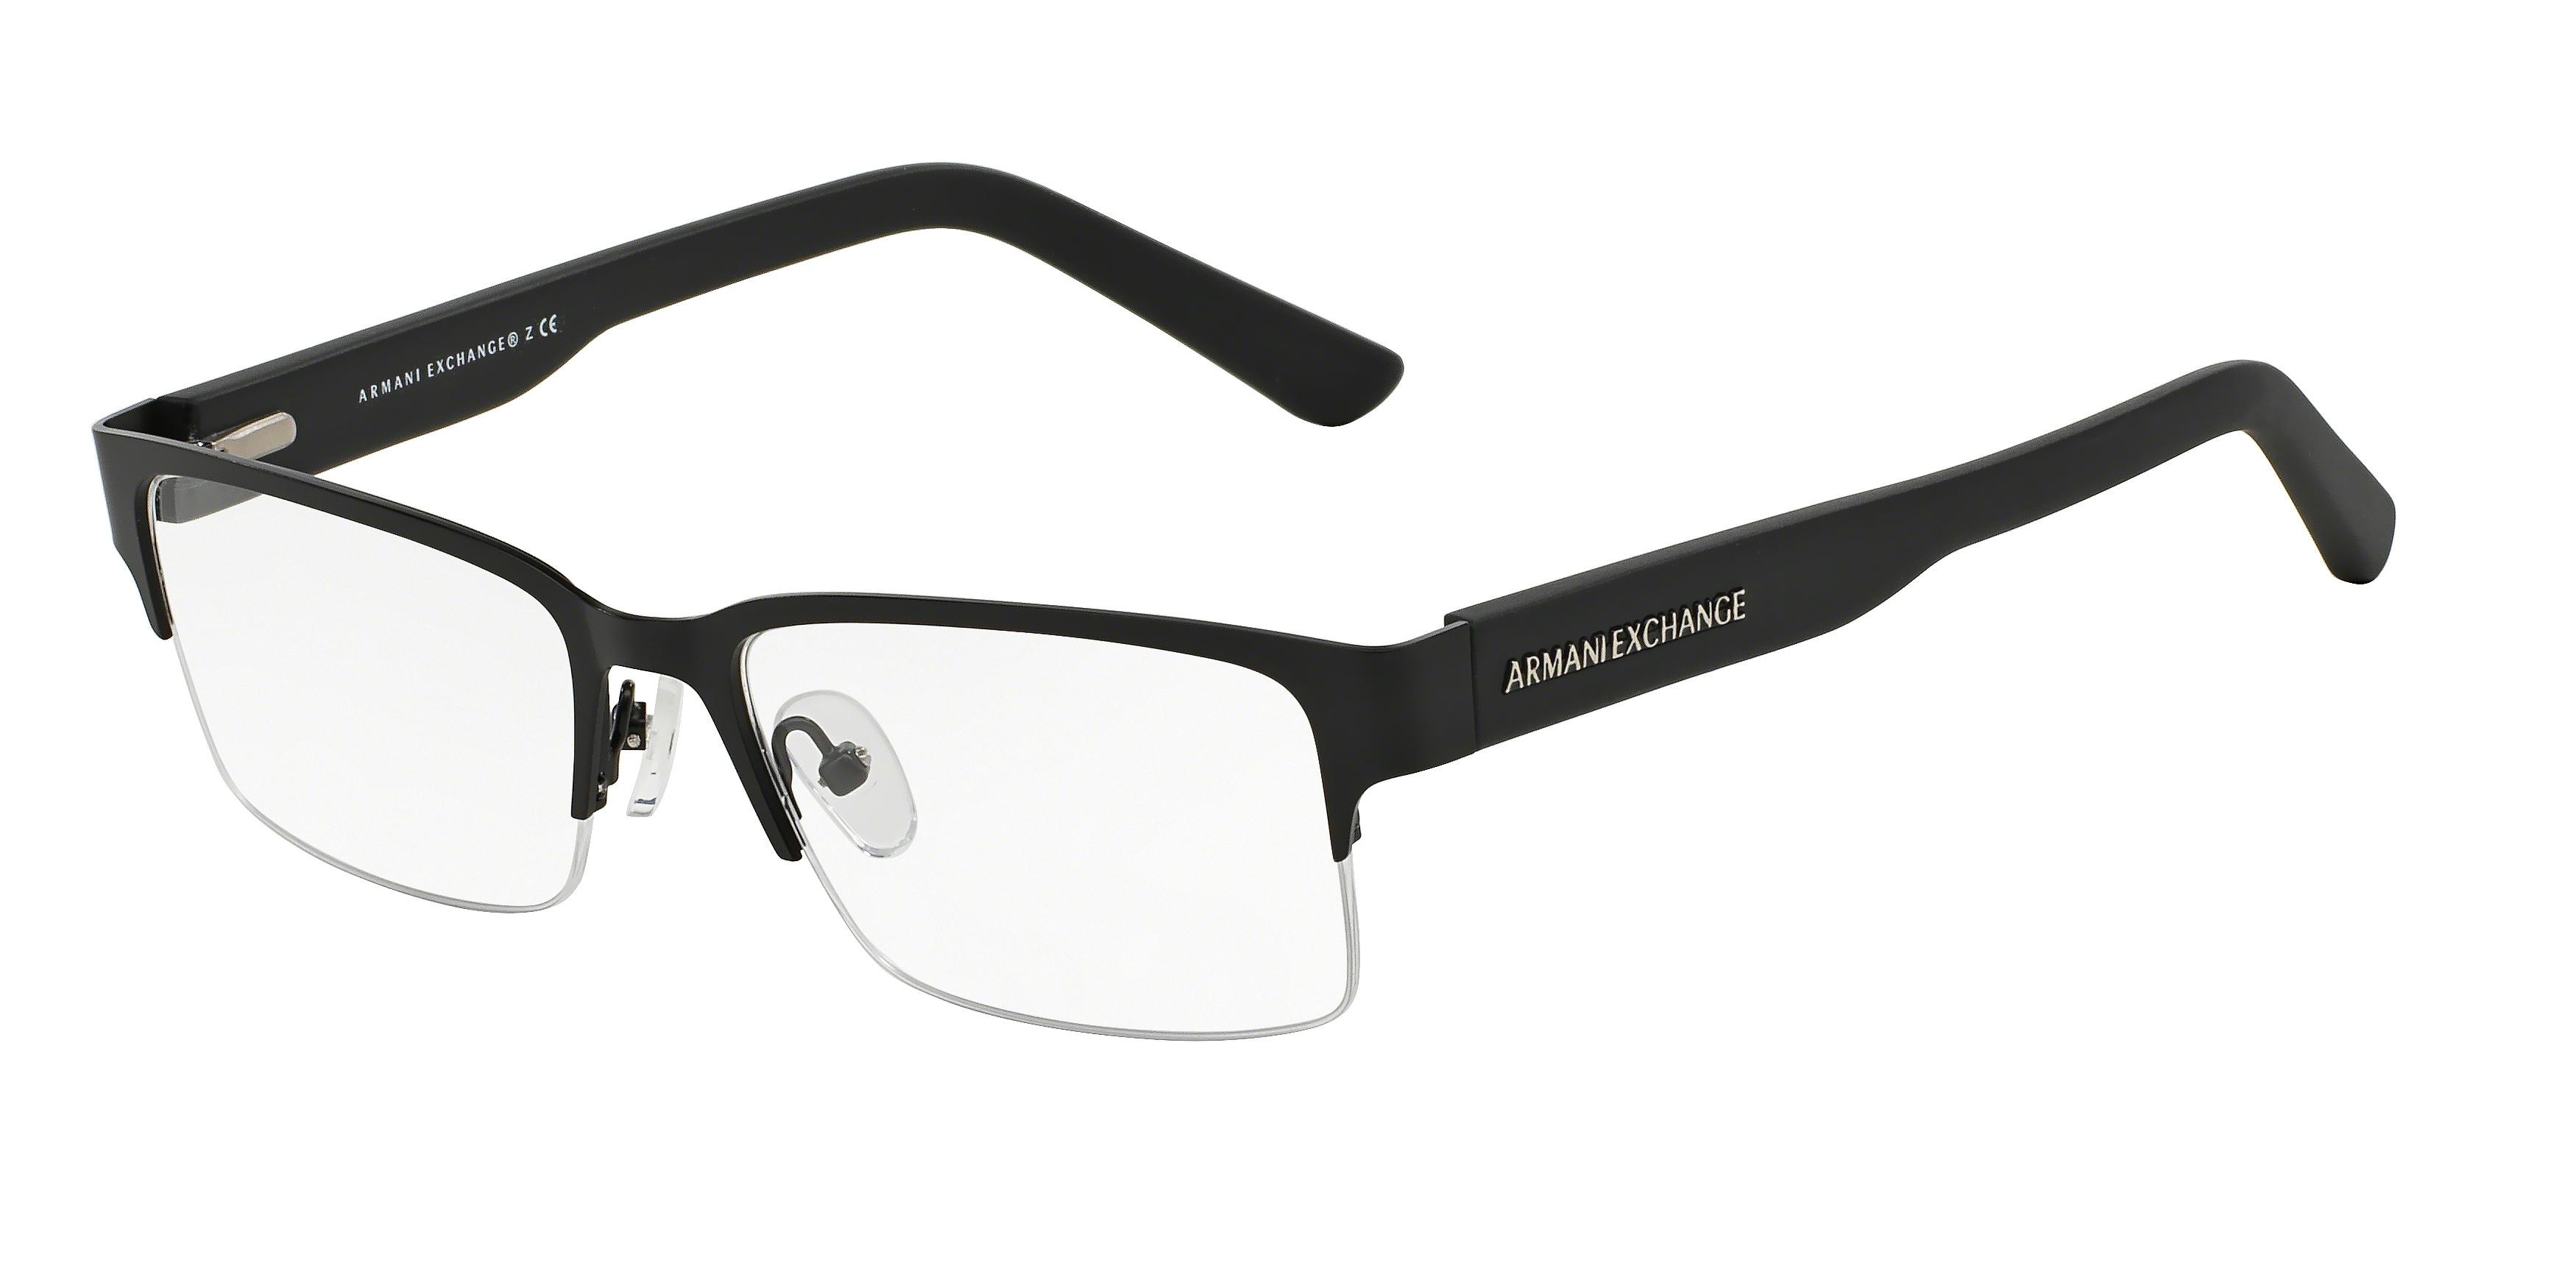 6d306c70d94 Armani Exchange AX1014 Progressive Prescription Eyeglasses w  Free Shipping  — 4 models